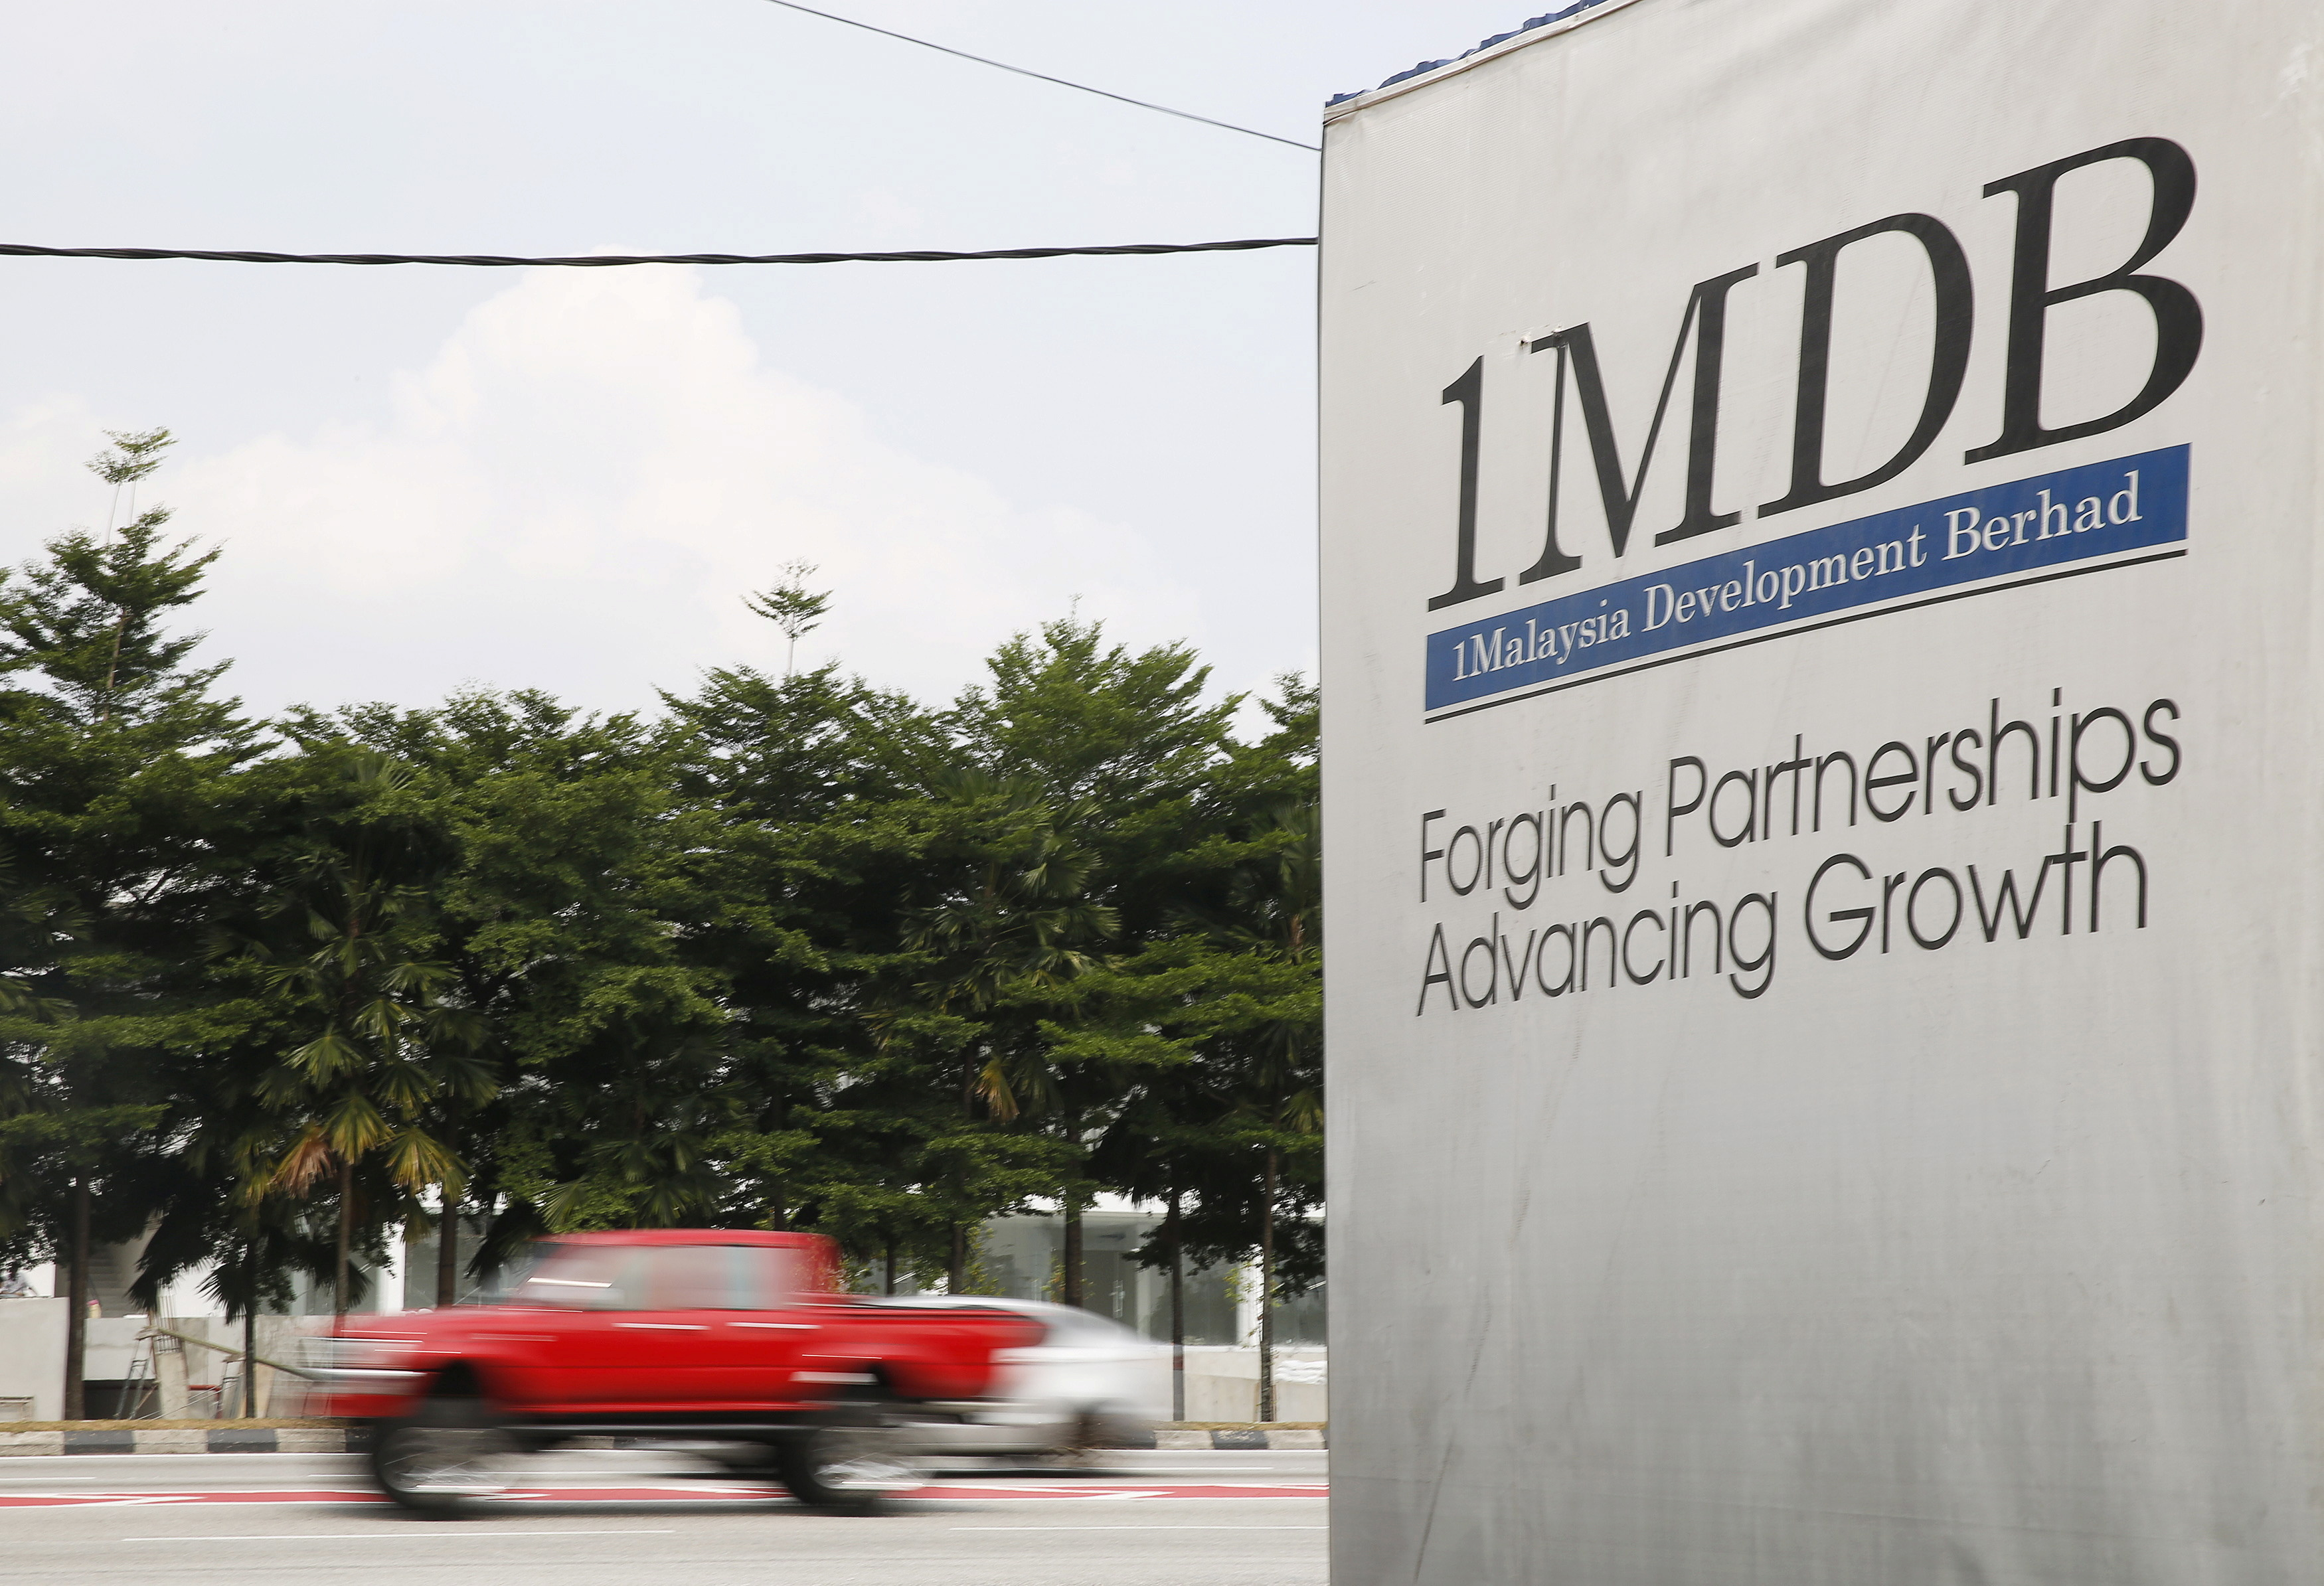 Traffic passes a 1Malaysia Development Berhad (1MDB) billboard at the Tun Razak Exchange development in Kuala Lumpur, Malaysia, July 6, 2015.REUTERS/Olivia Harris